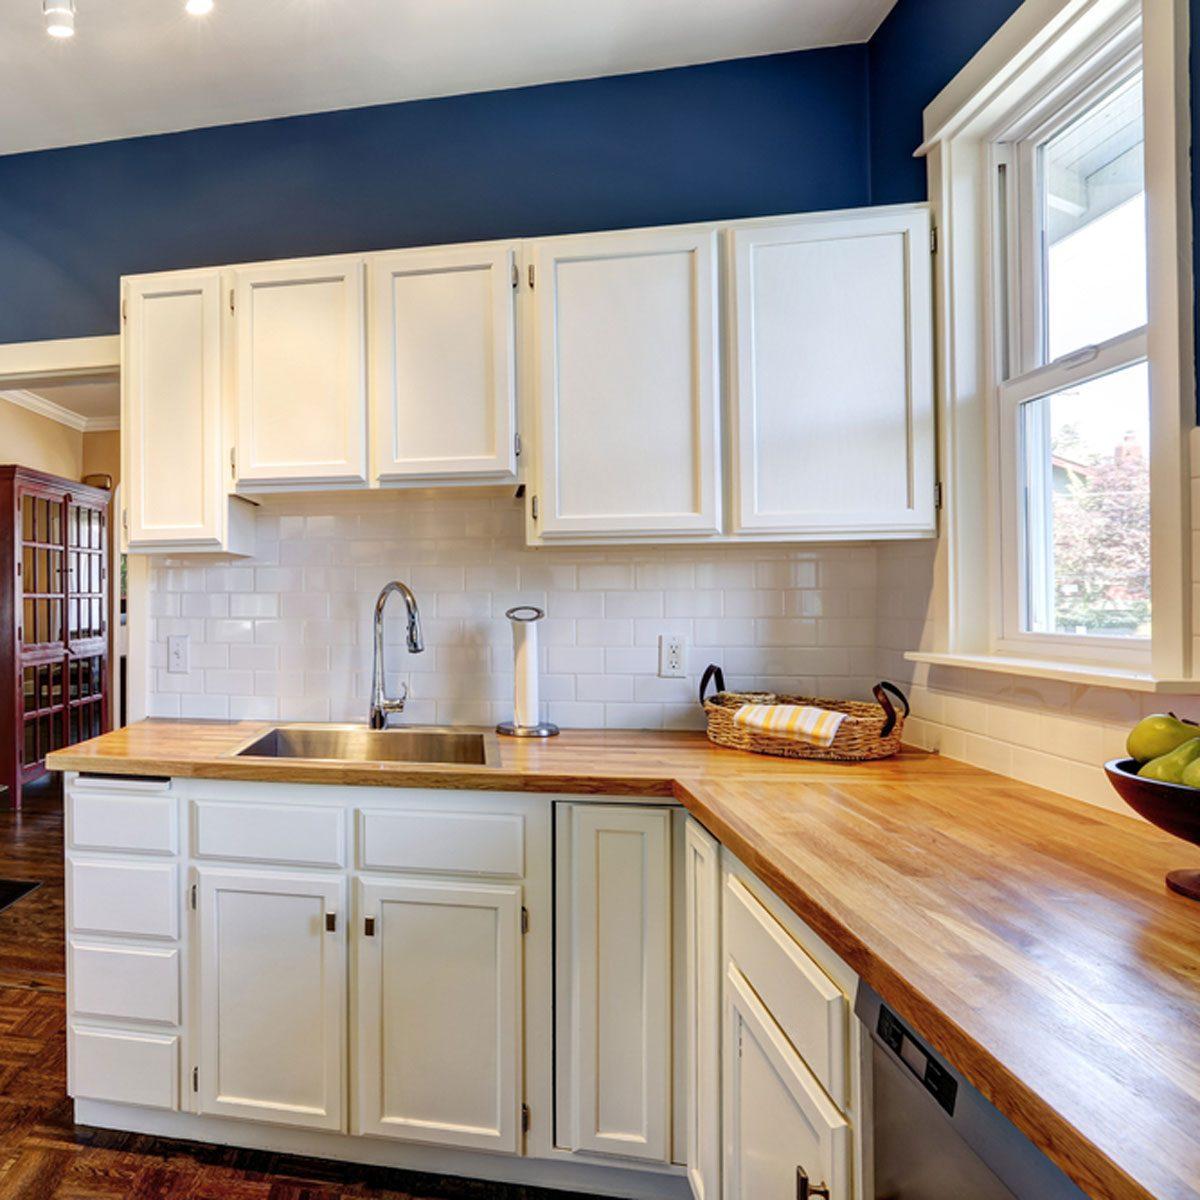 Kitchen Cabinet Carcass Construction